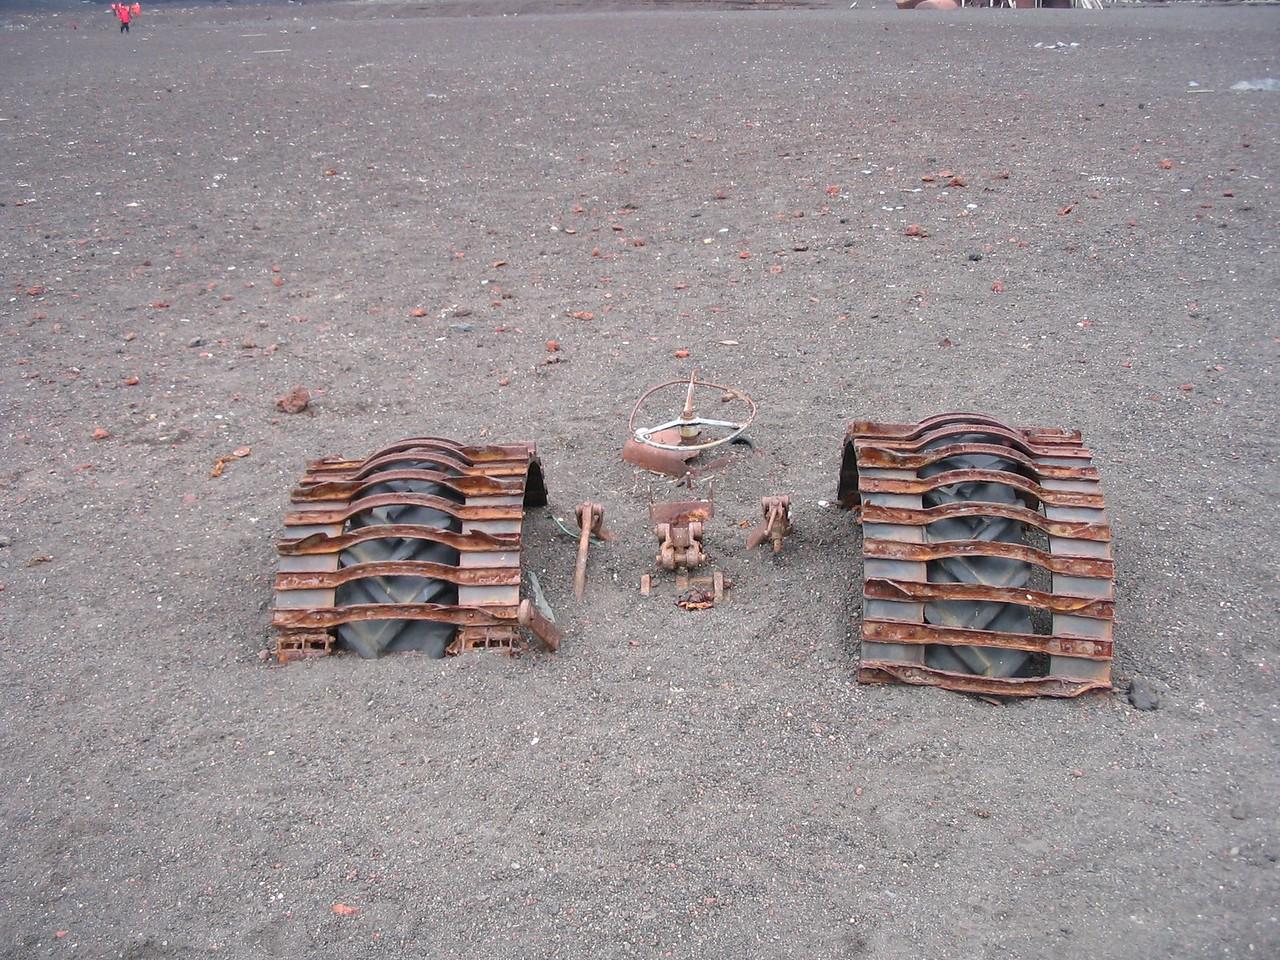 Tractor buried by ash - Andrew Gossen